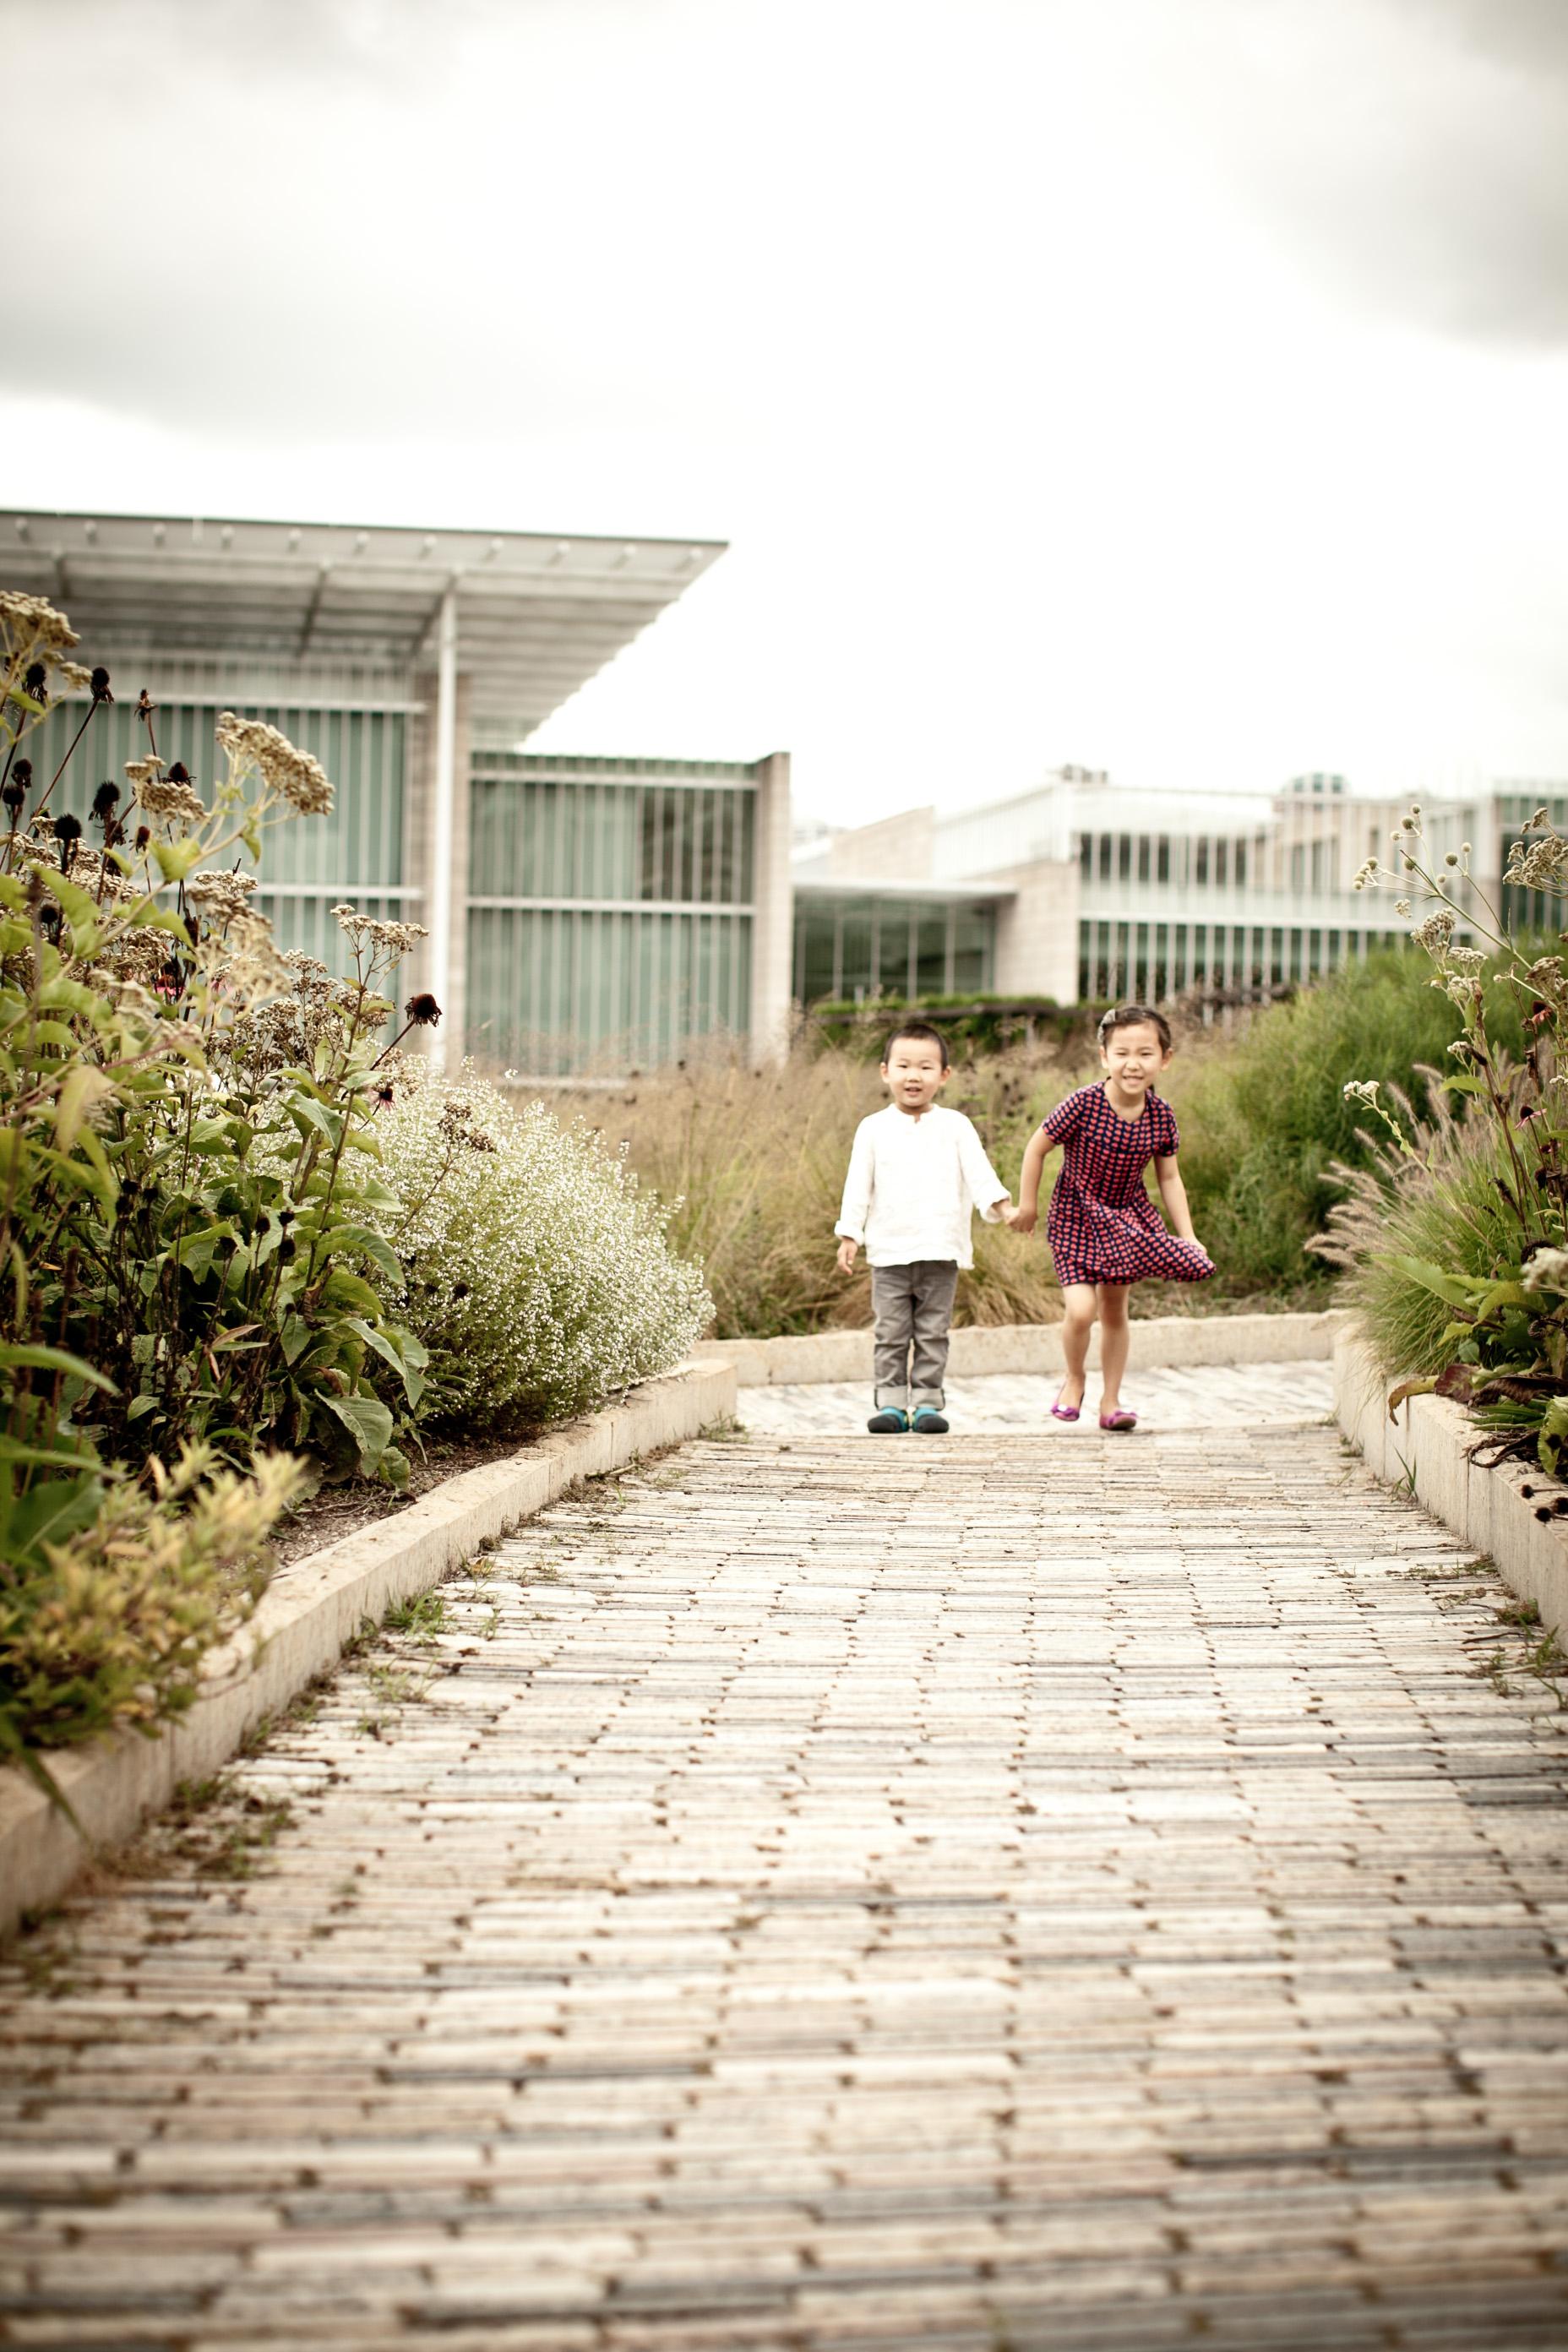 wendi & rudi lifestyle family photo session lurie gardens millenium park chicago blog-0002.jpg